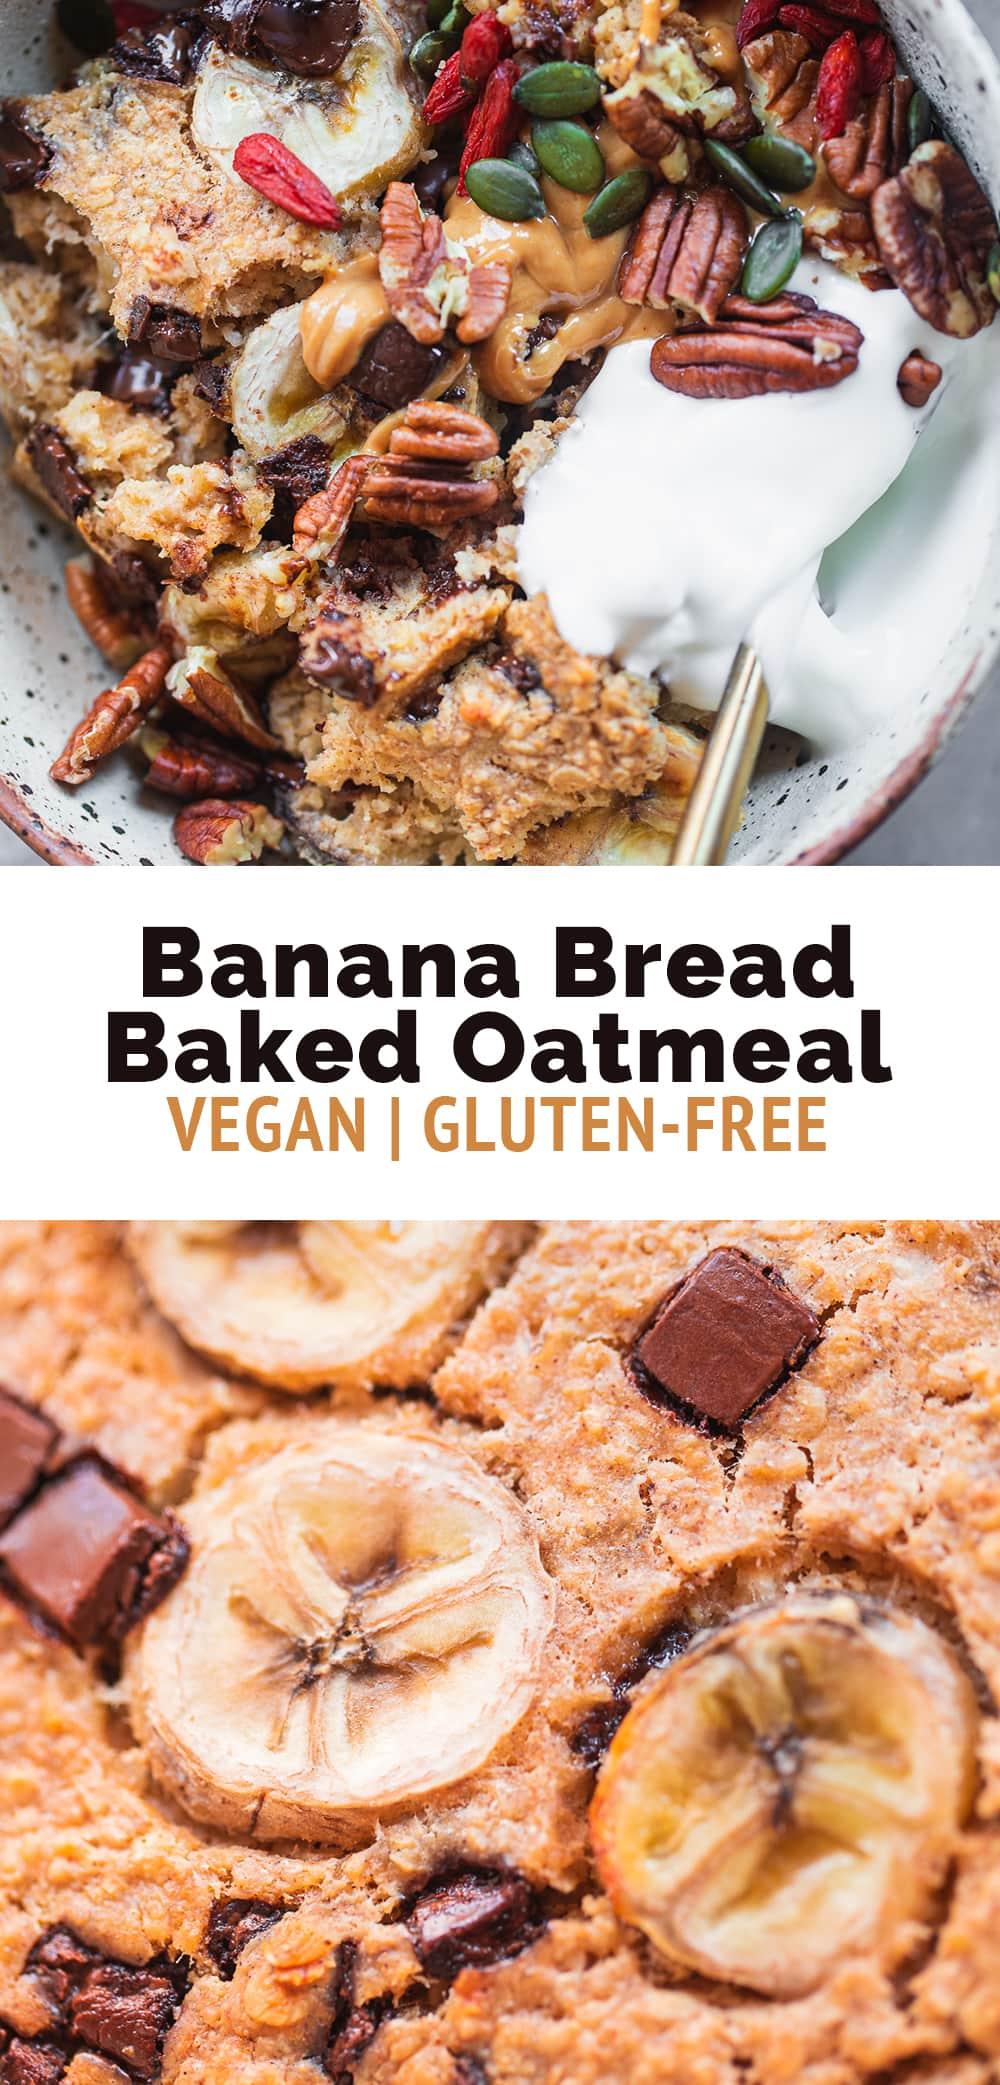 Vegan Banana Bread Baked Oatmeal